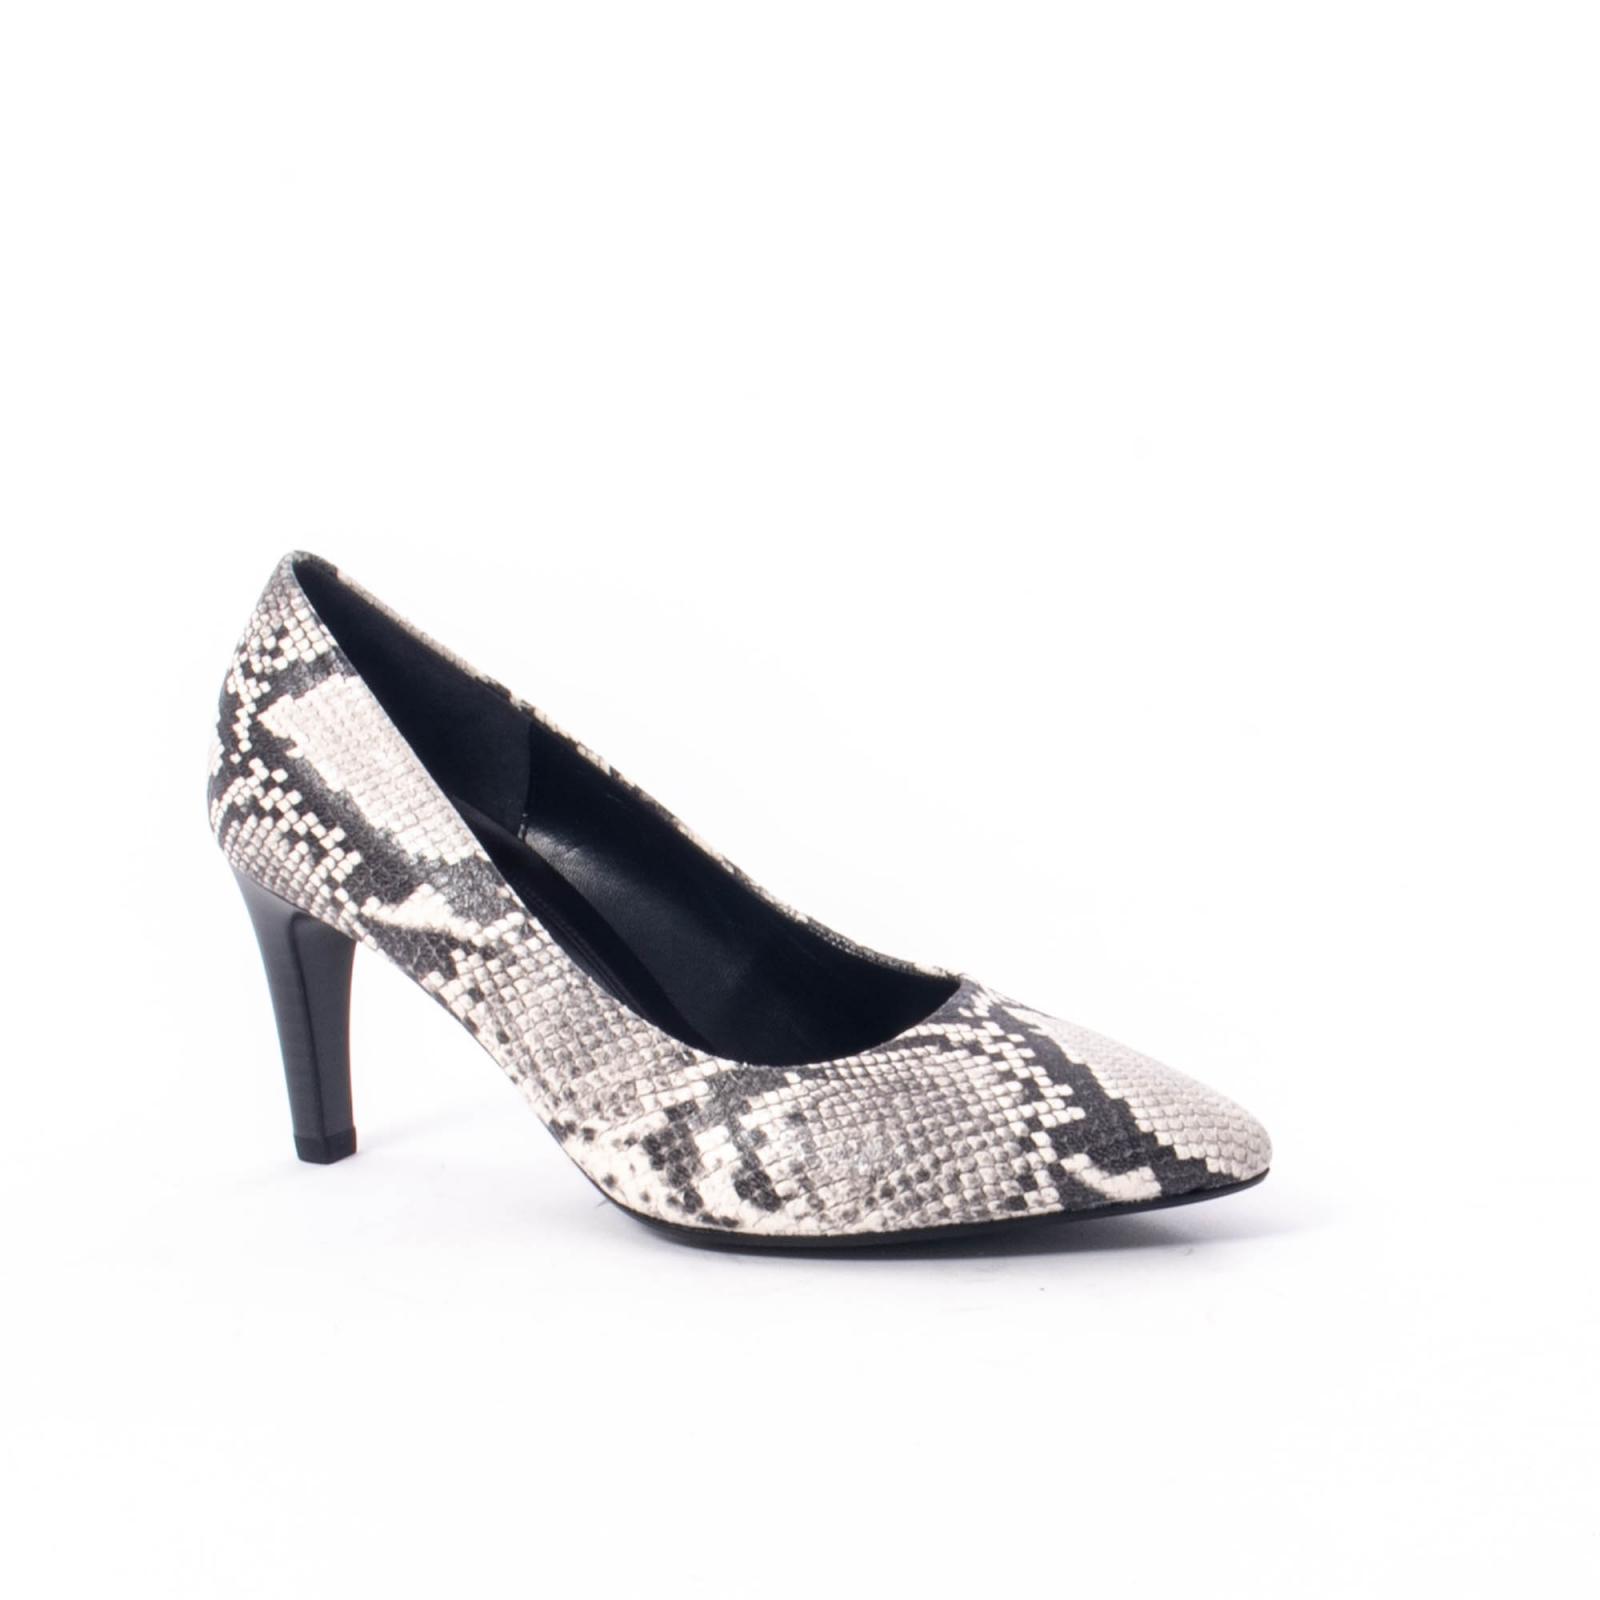 sports shoes 503b5 20148 Pantofi eleganti dama piele naturala Gabor 3138030, python grau